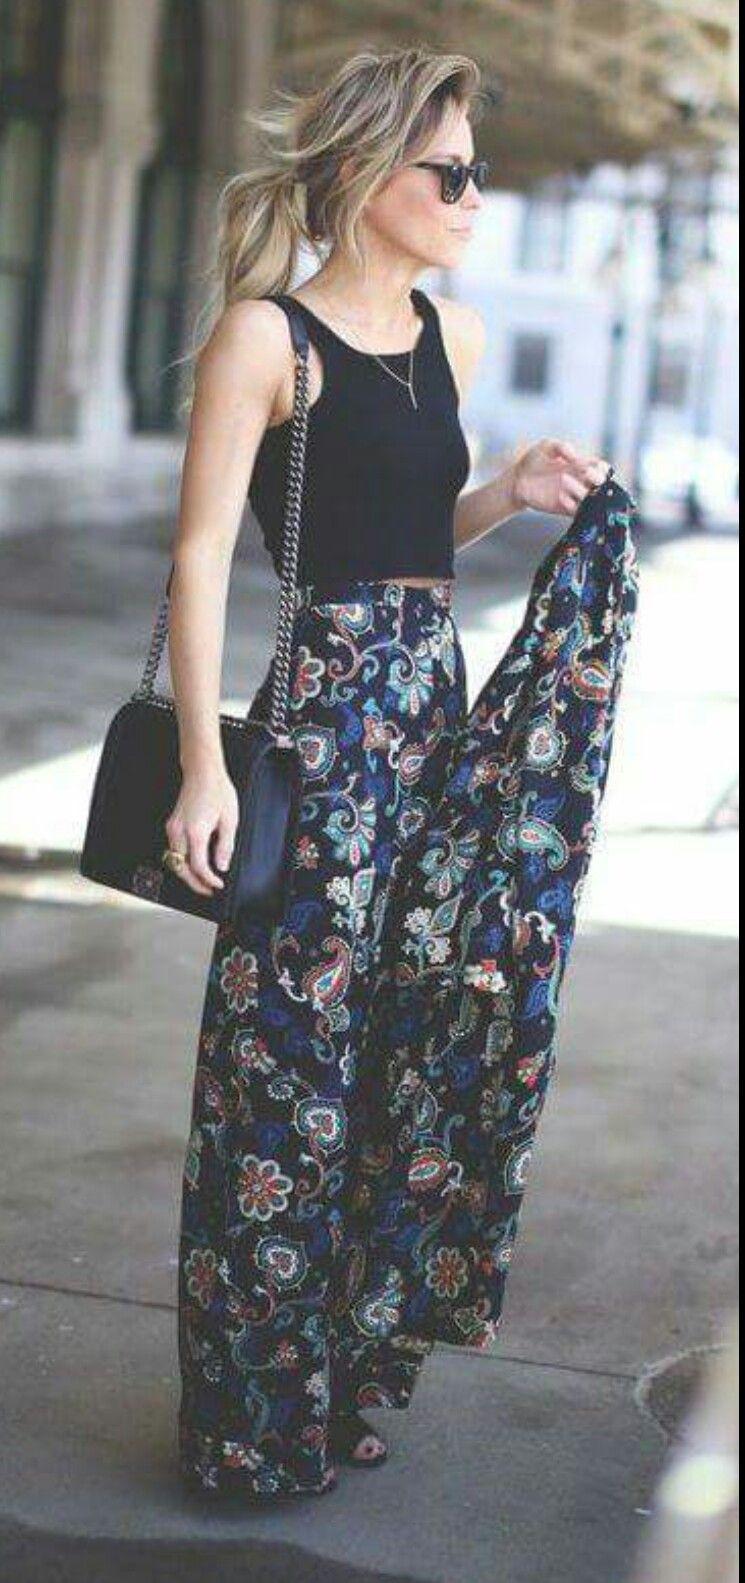 Outfit Con Pantalon Muy Holgado Fashion Stylish Fall Outfits Style